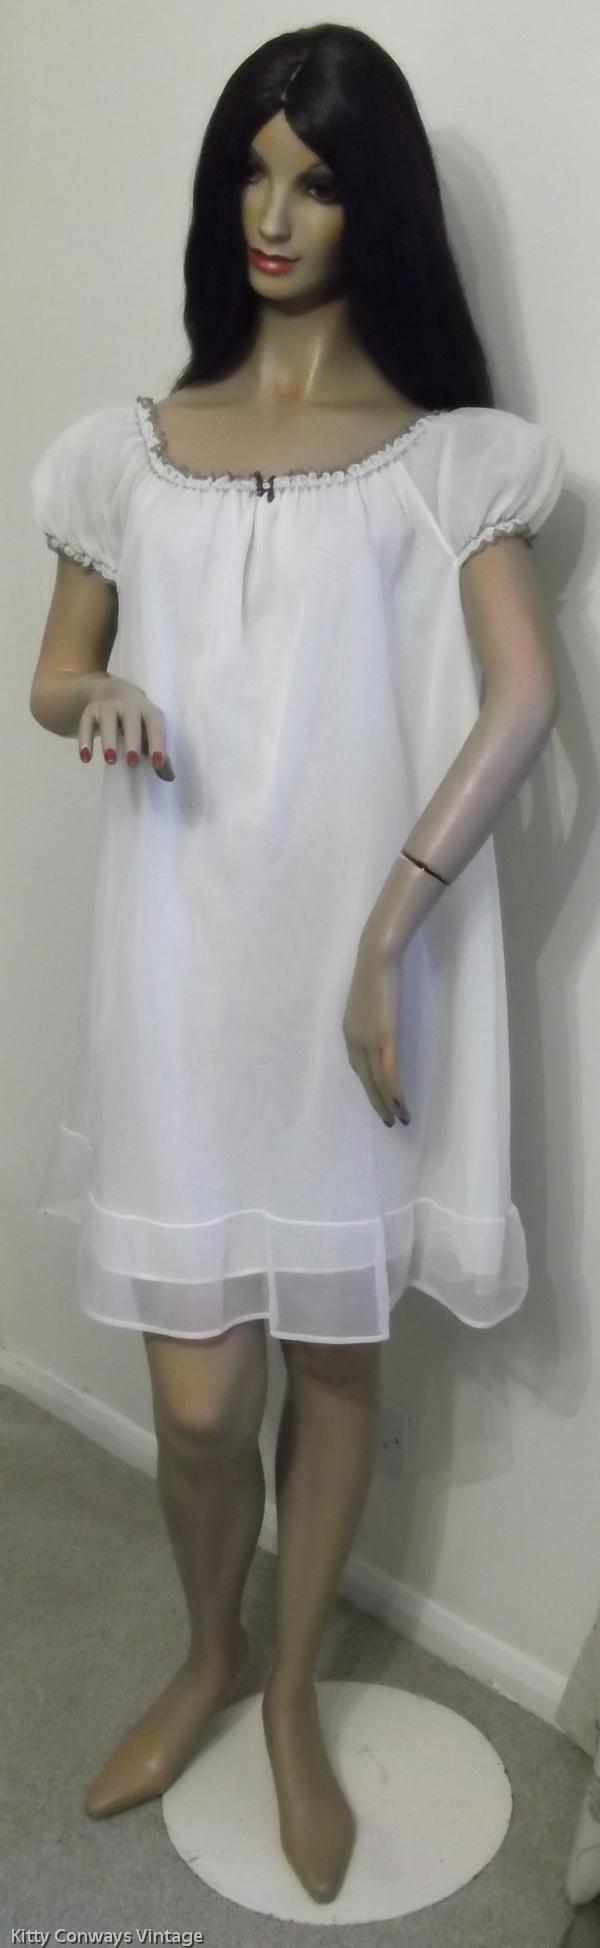 1960s/70s C&A baby doll nightdress